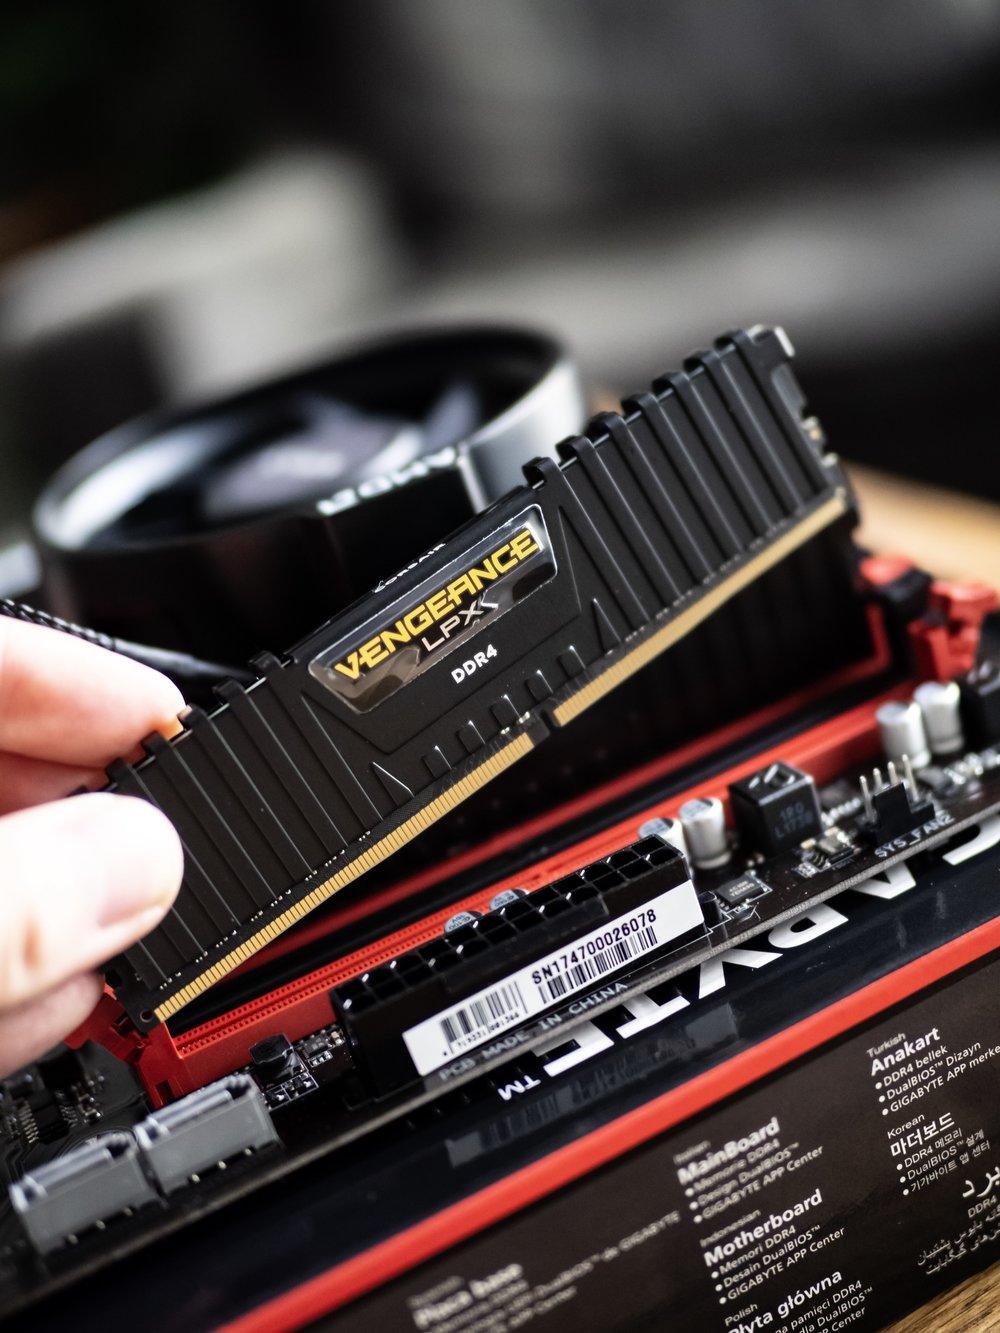 Gaming PC Build Gigabyte AB350 Motherboard Corsair Vengeance Memory RAM DDR4